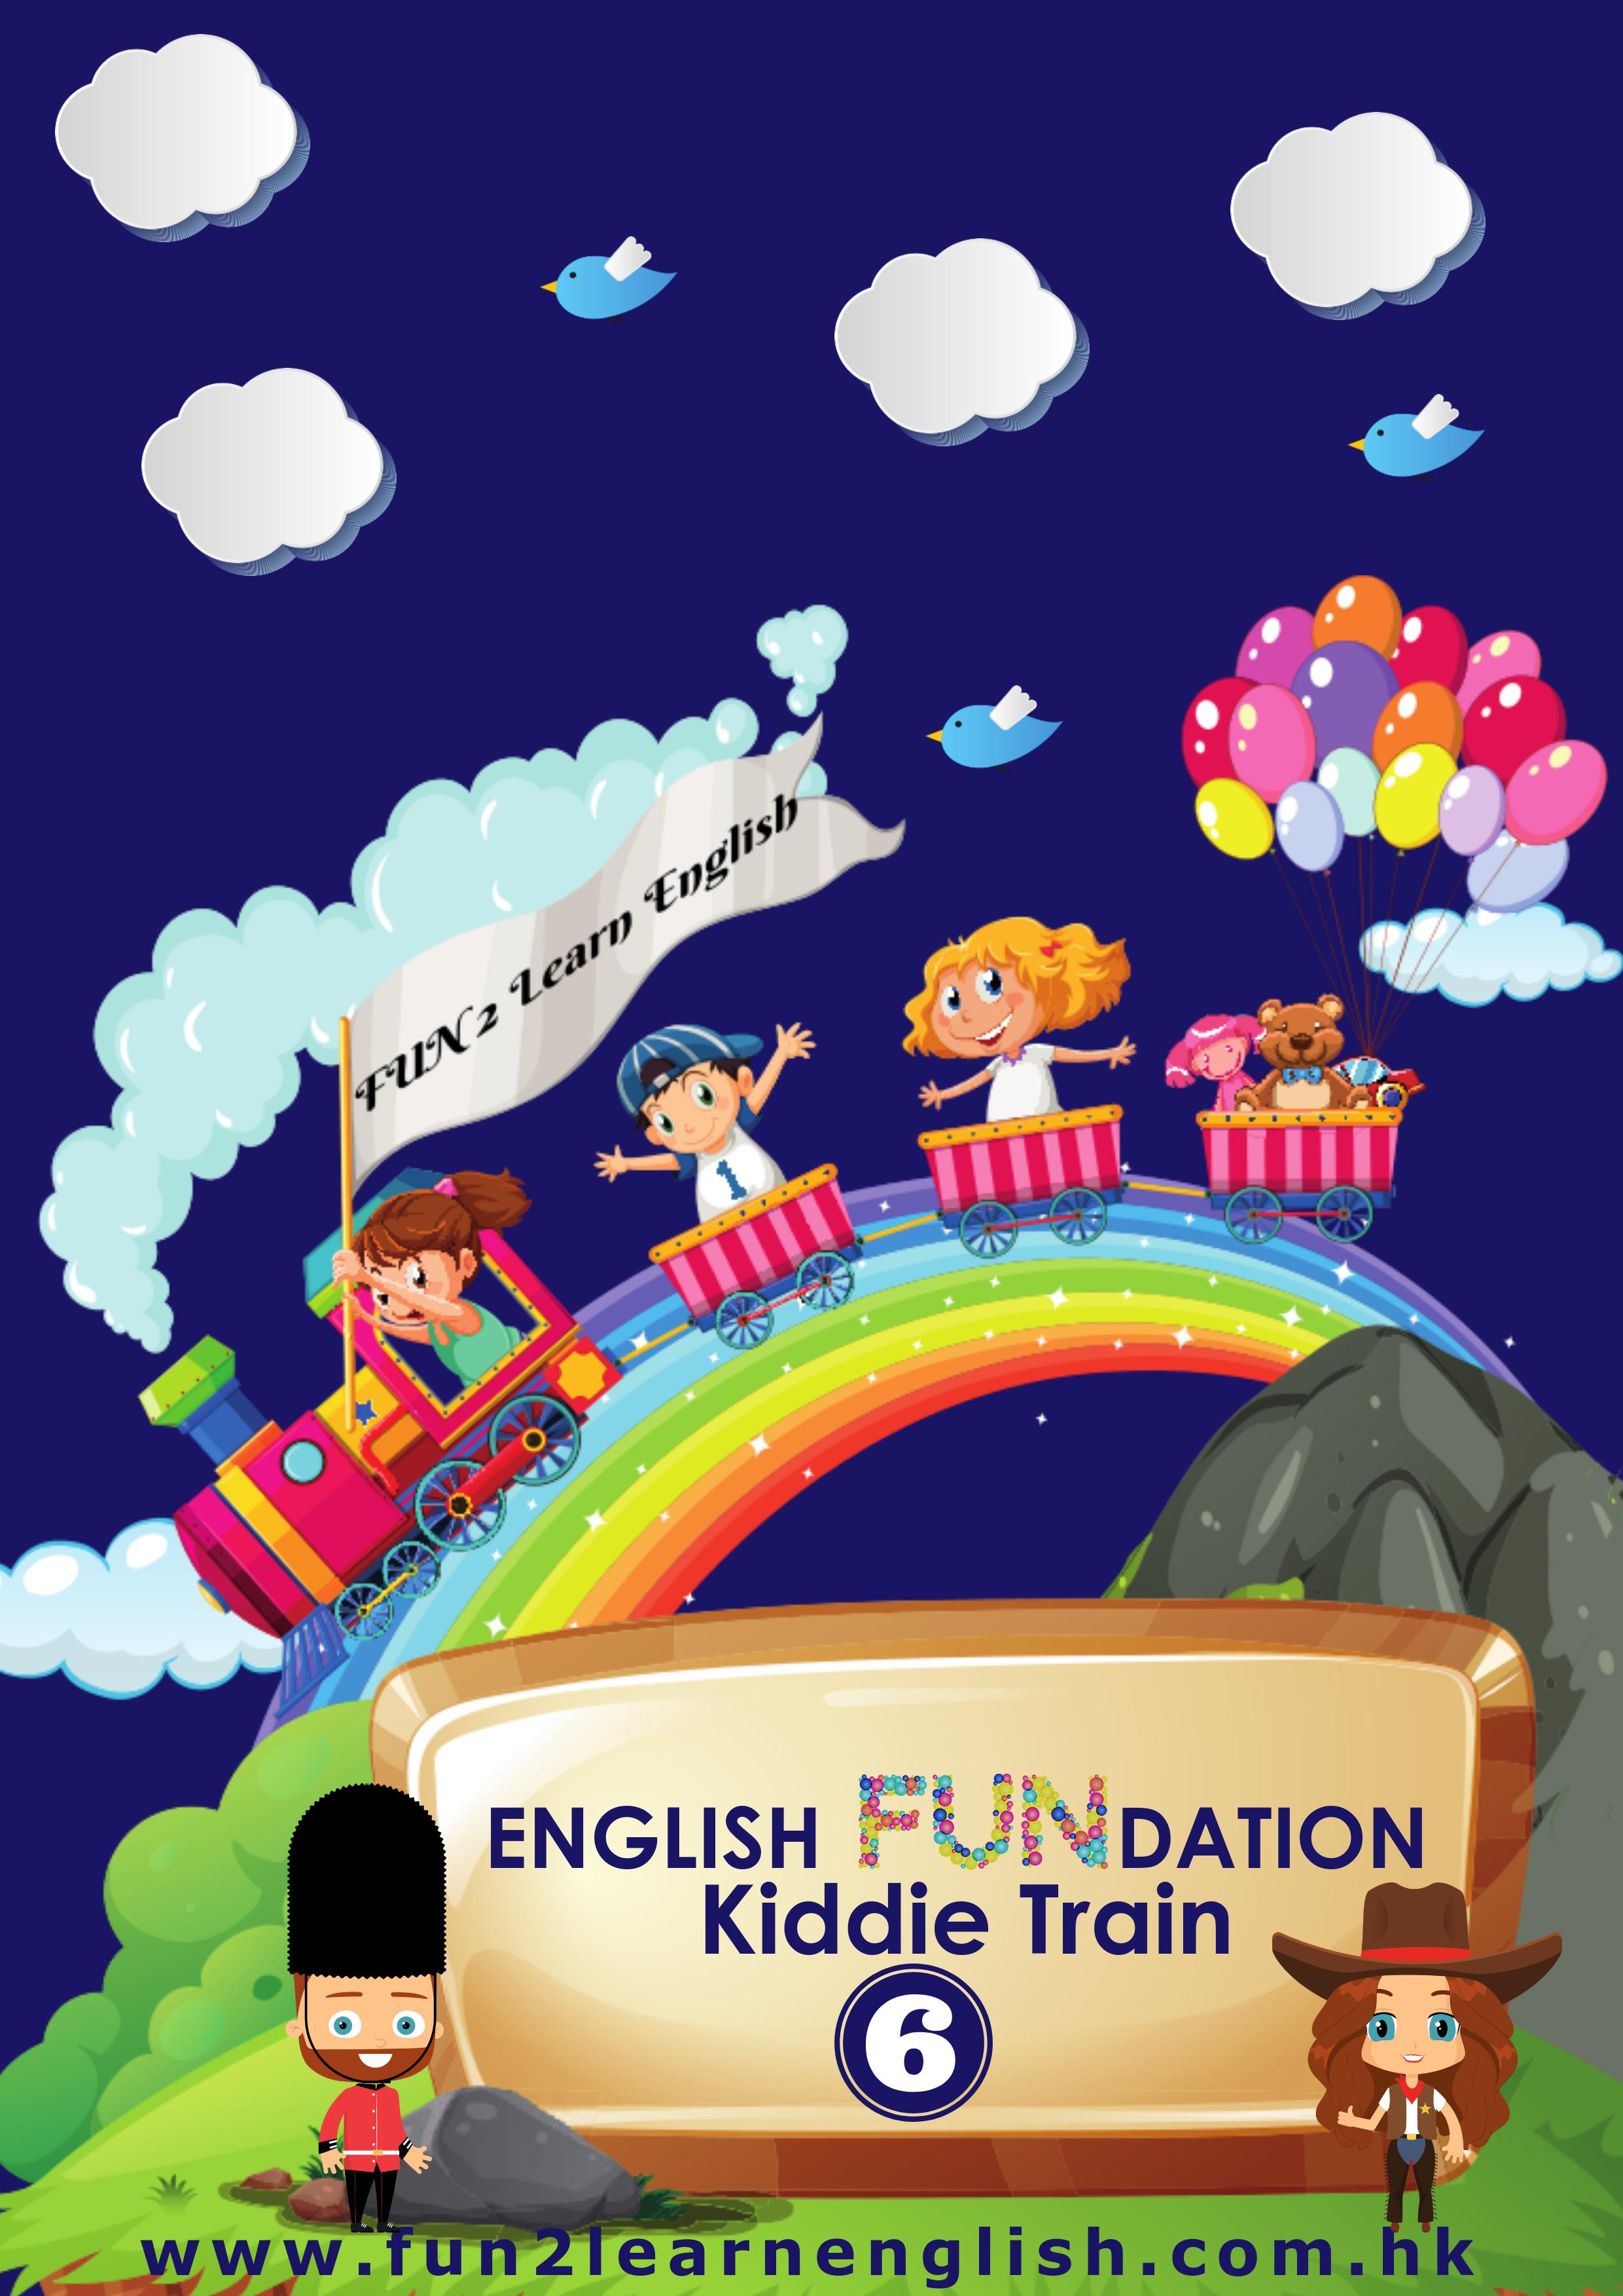 English FUNdation for K1 Students